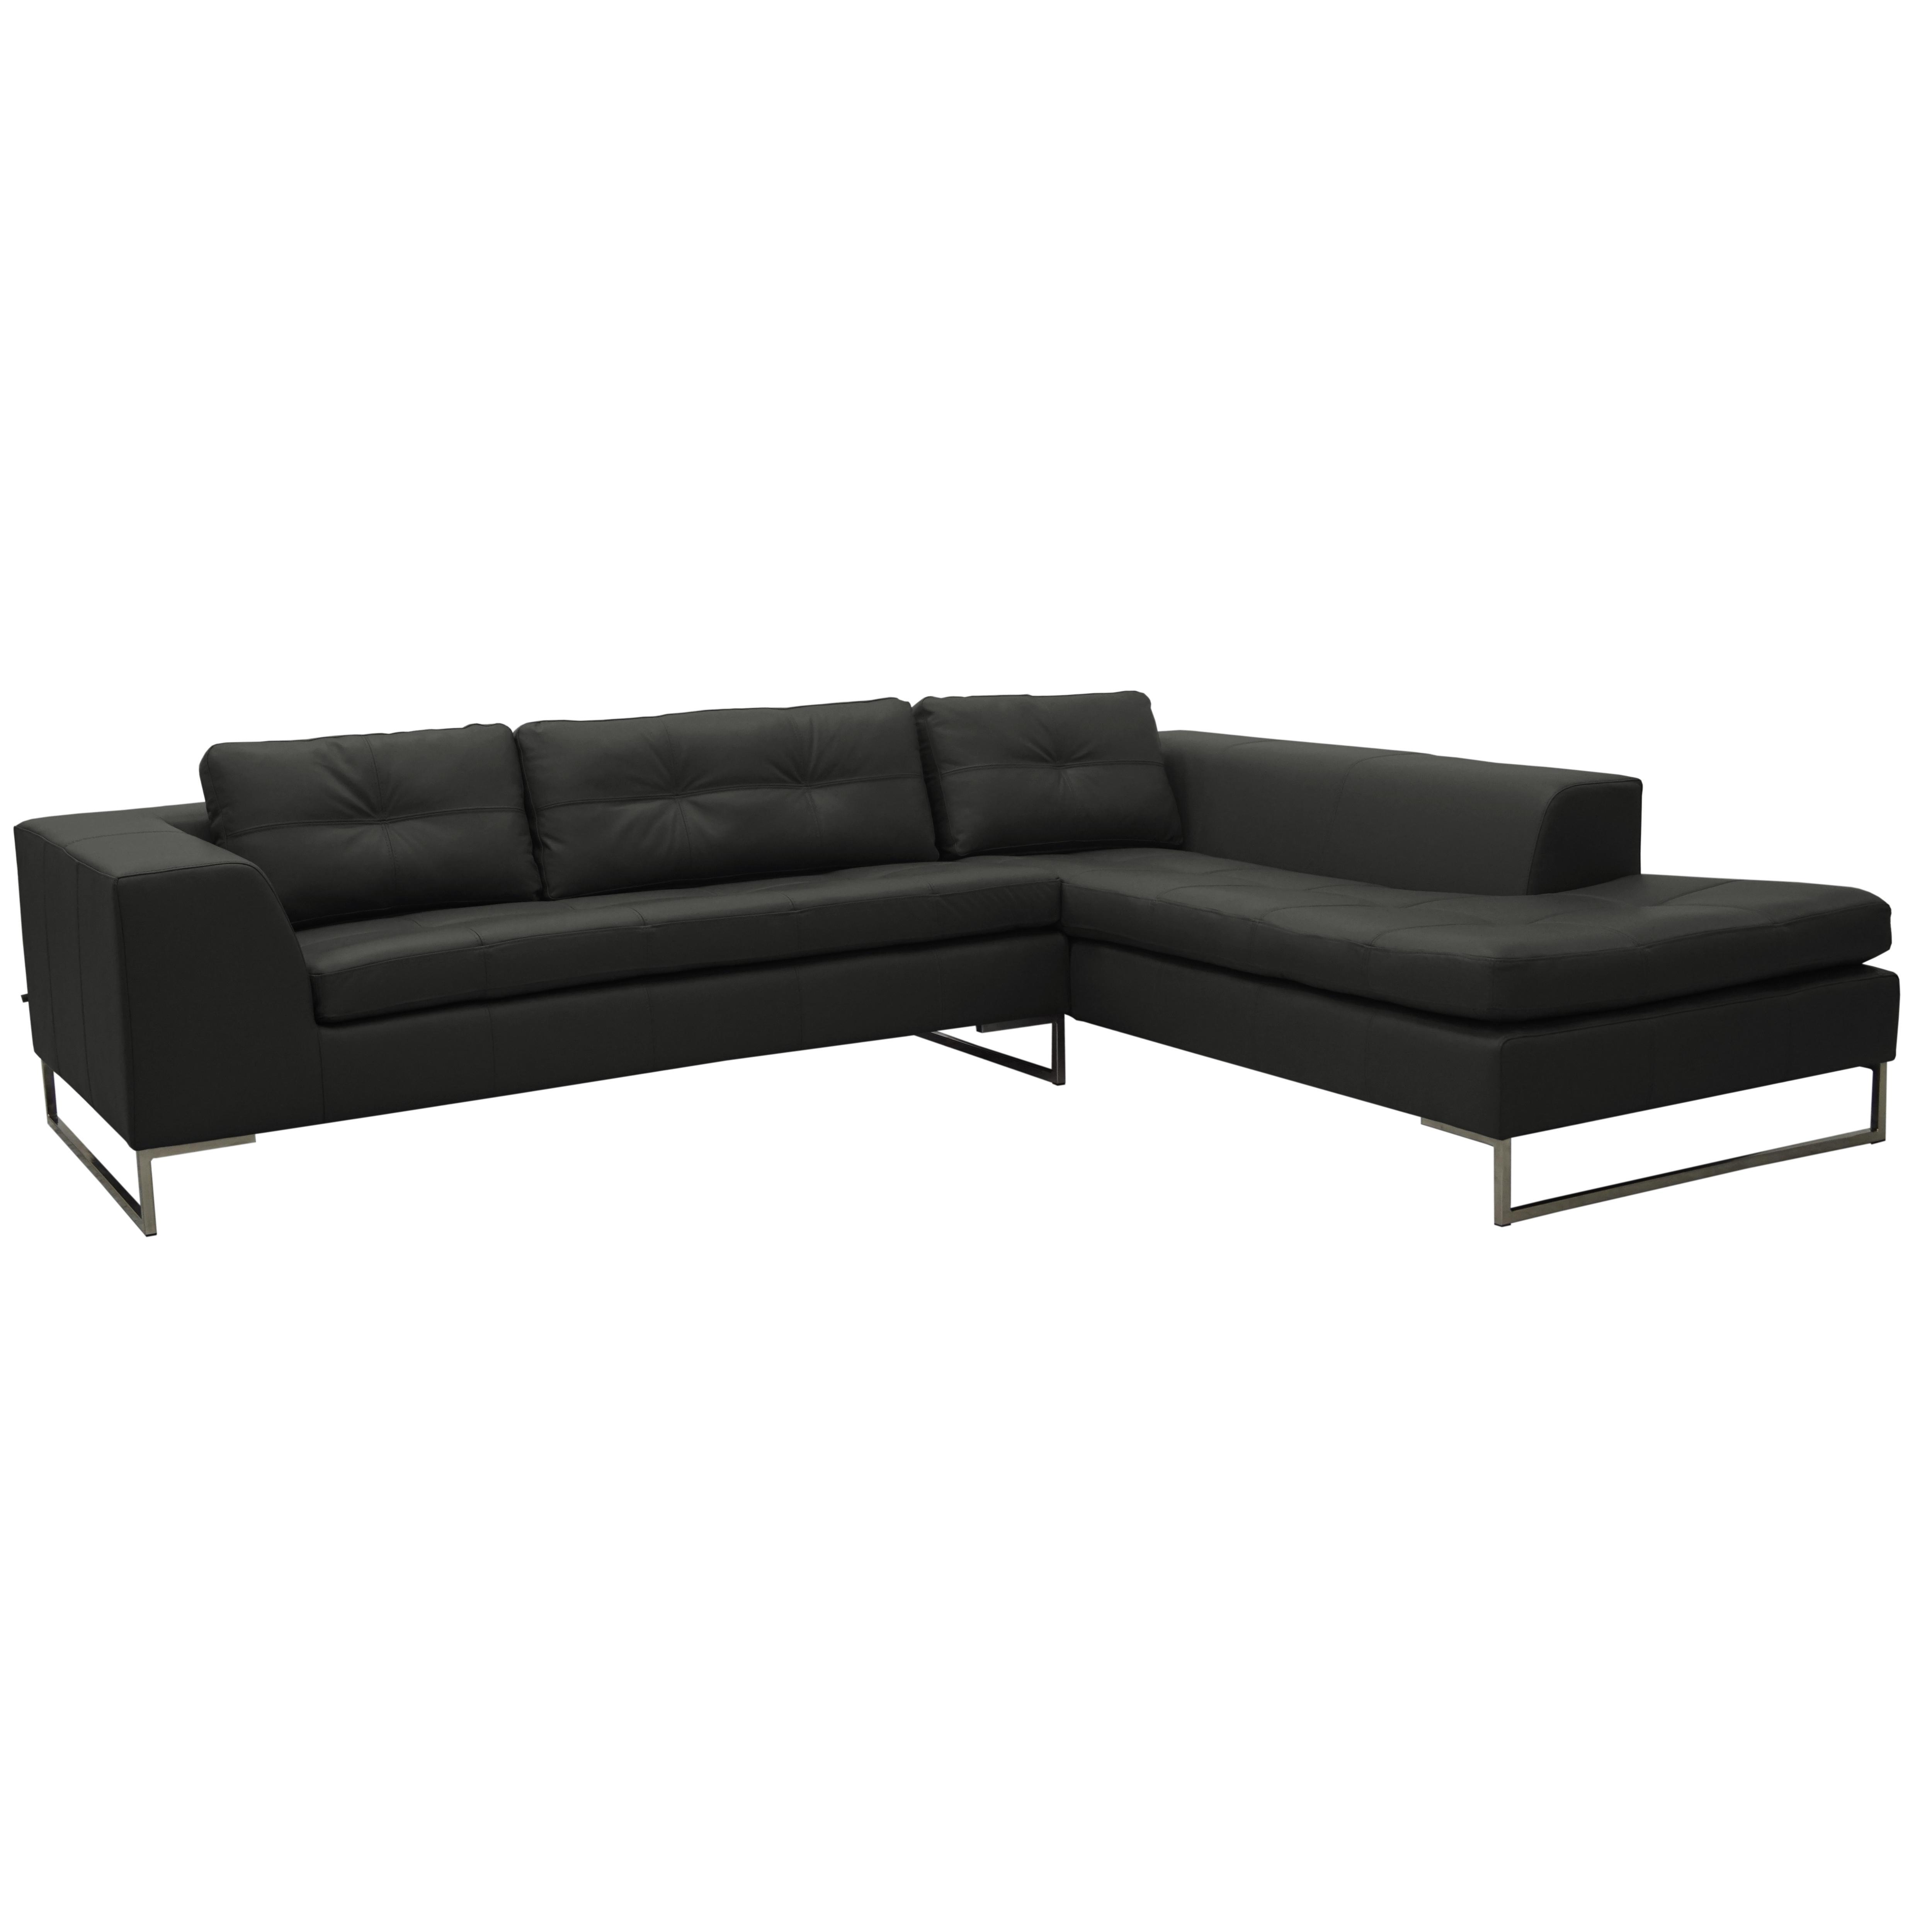 Toleda left hand facing arm corner sofa mollis leather dark green